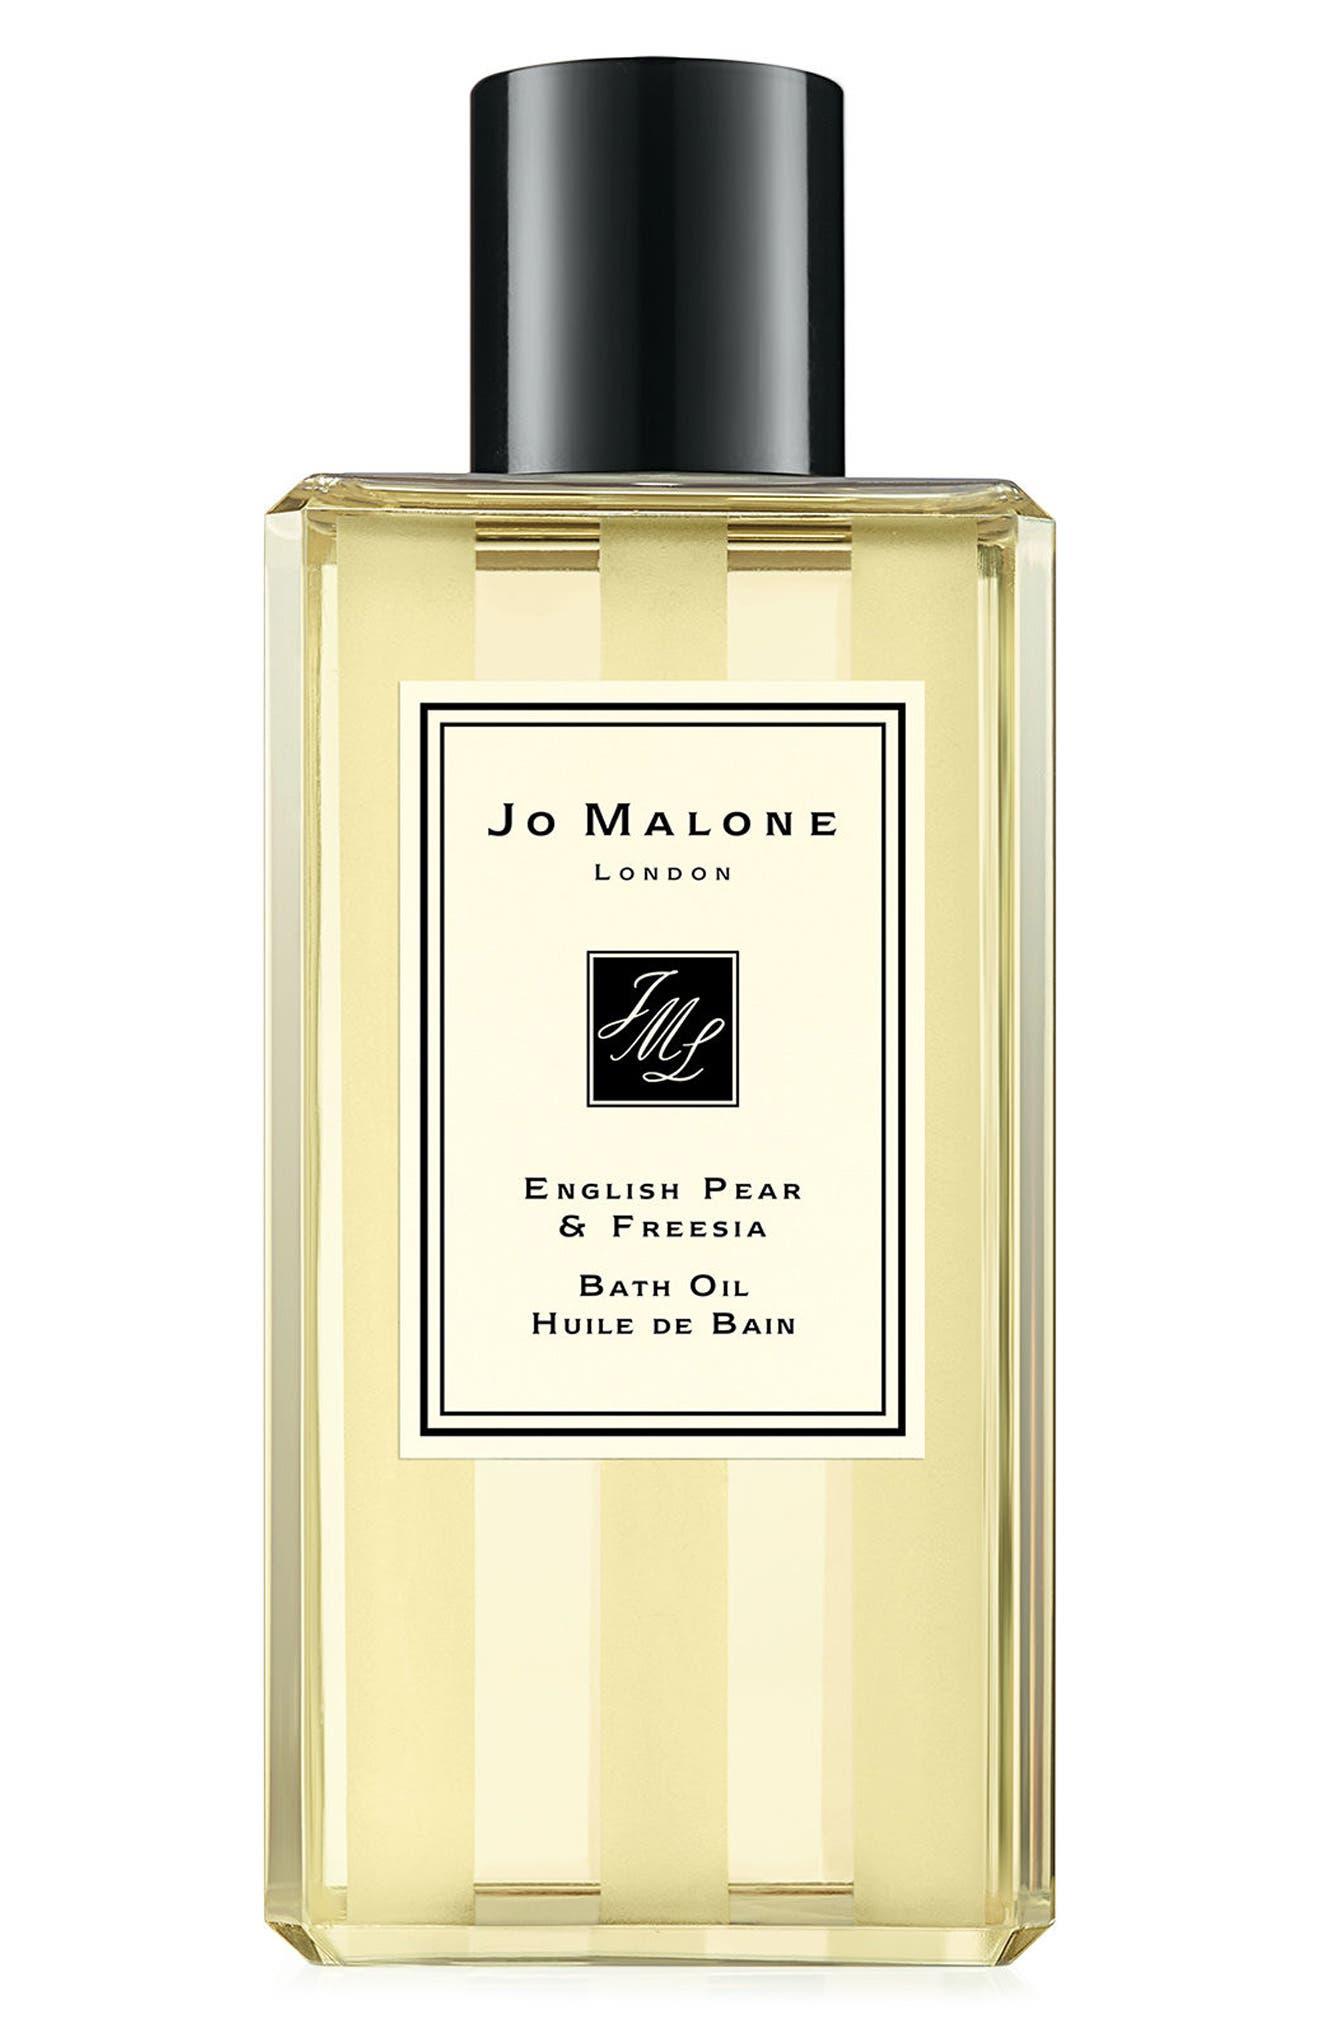 Jo Malone London™ 'English Pear & Freesia' Bath Oil